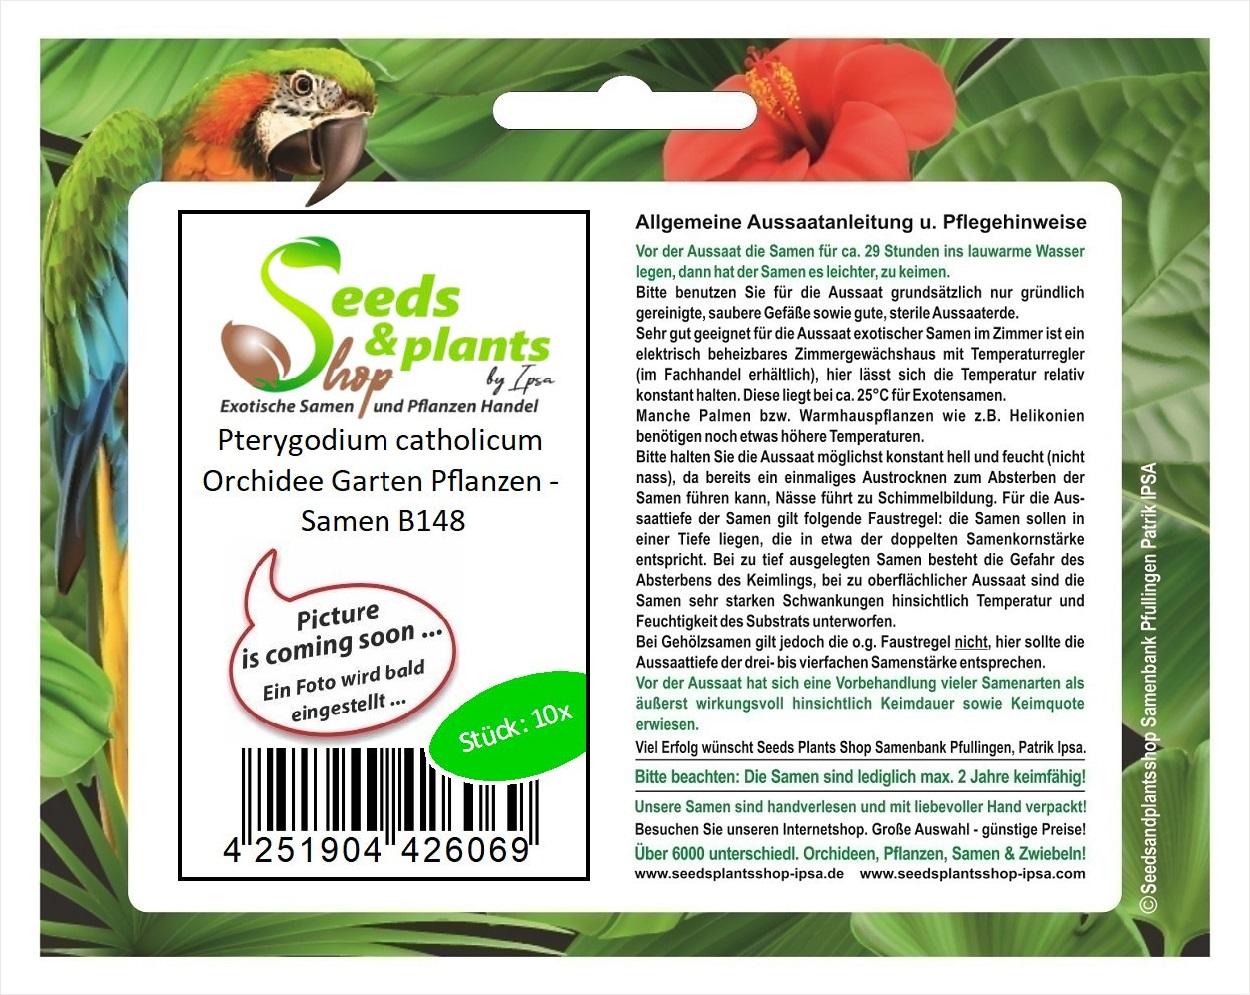 Samen B148 10x Pterygodium catholicum Orchidee Garten Pflanzen